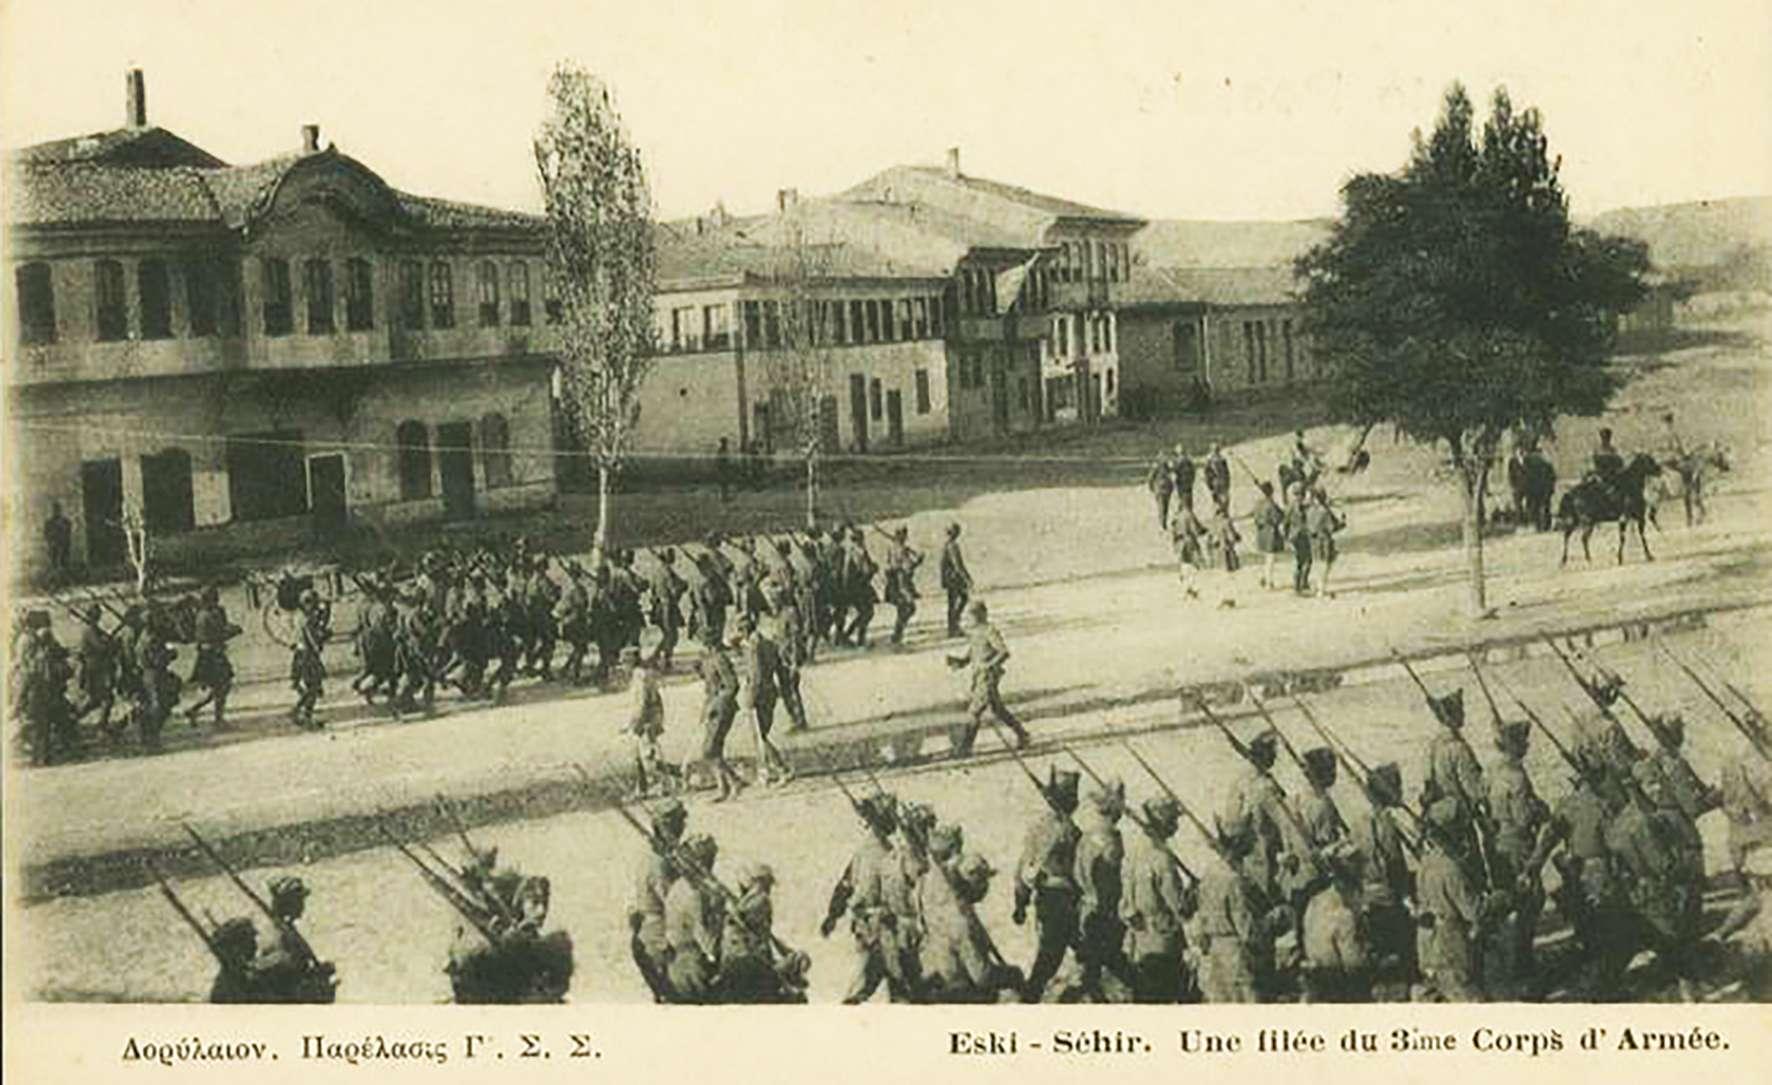 Eski Séhir filée Corps d Armée Παρελάση τμημάτων στο Εσκί Σεχίρ